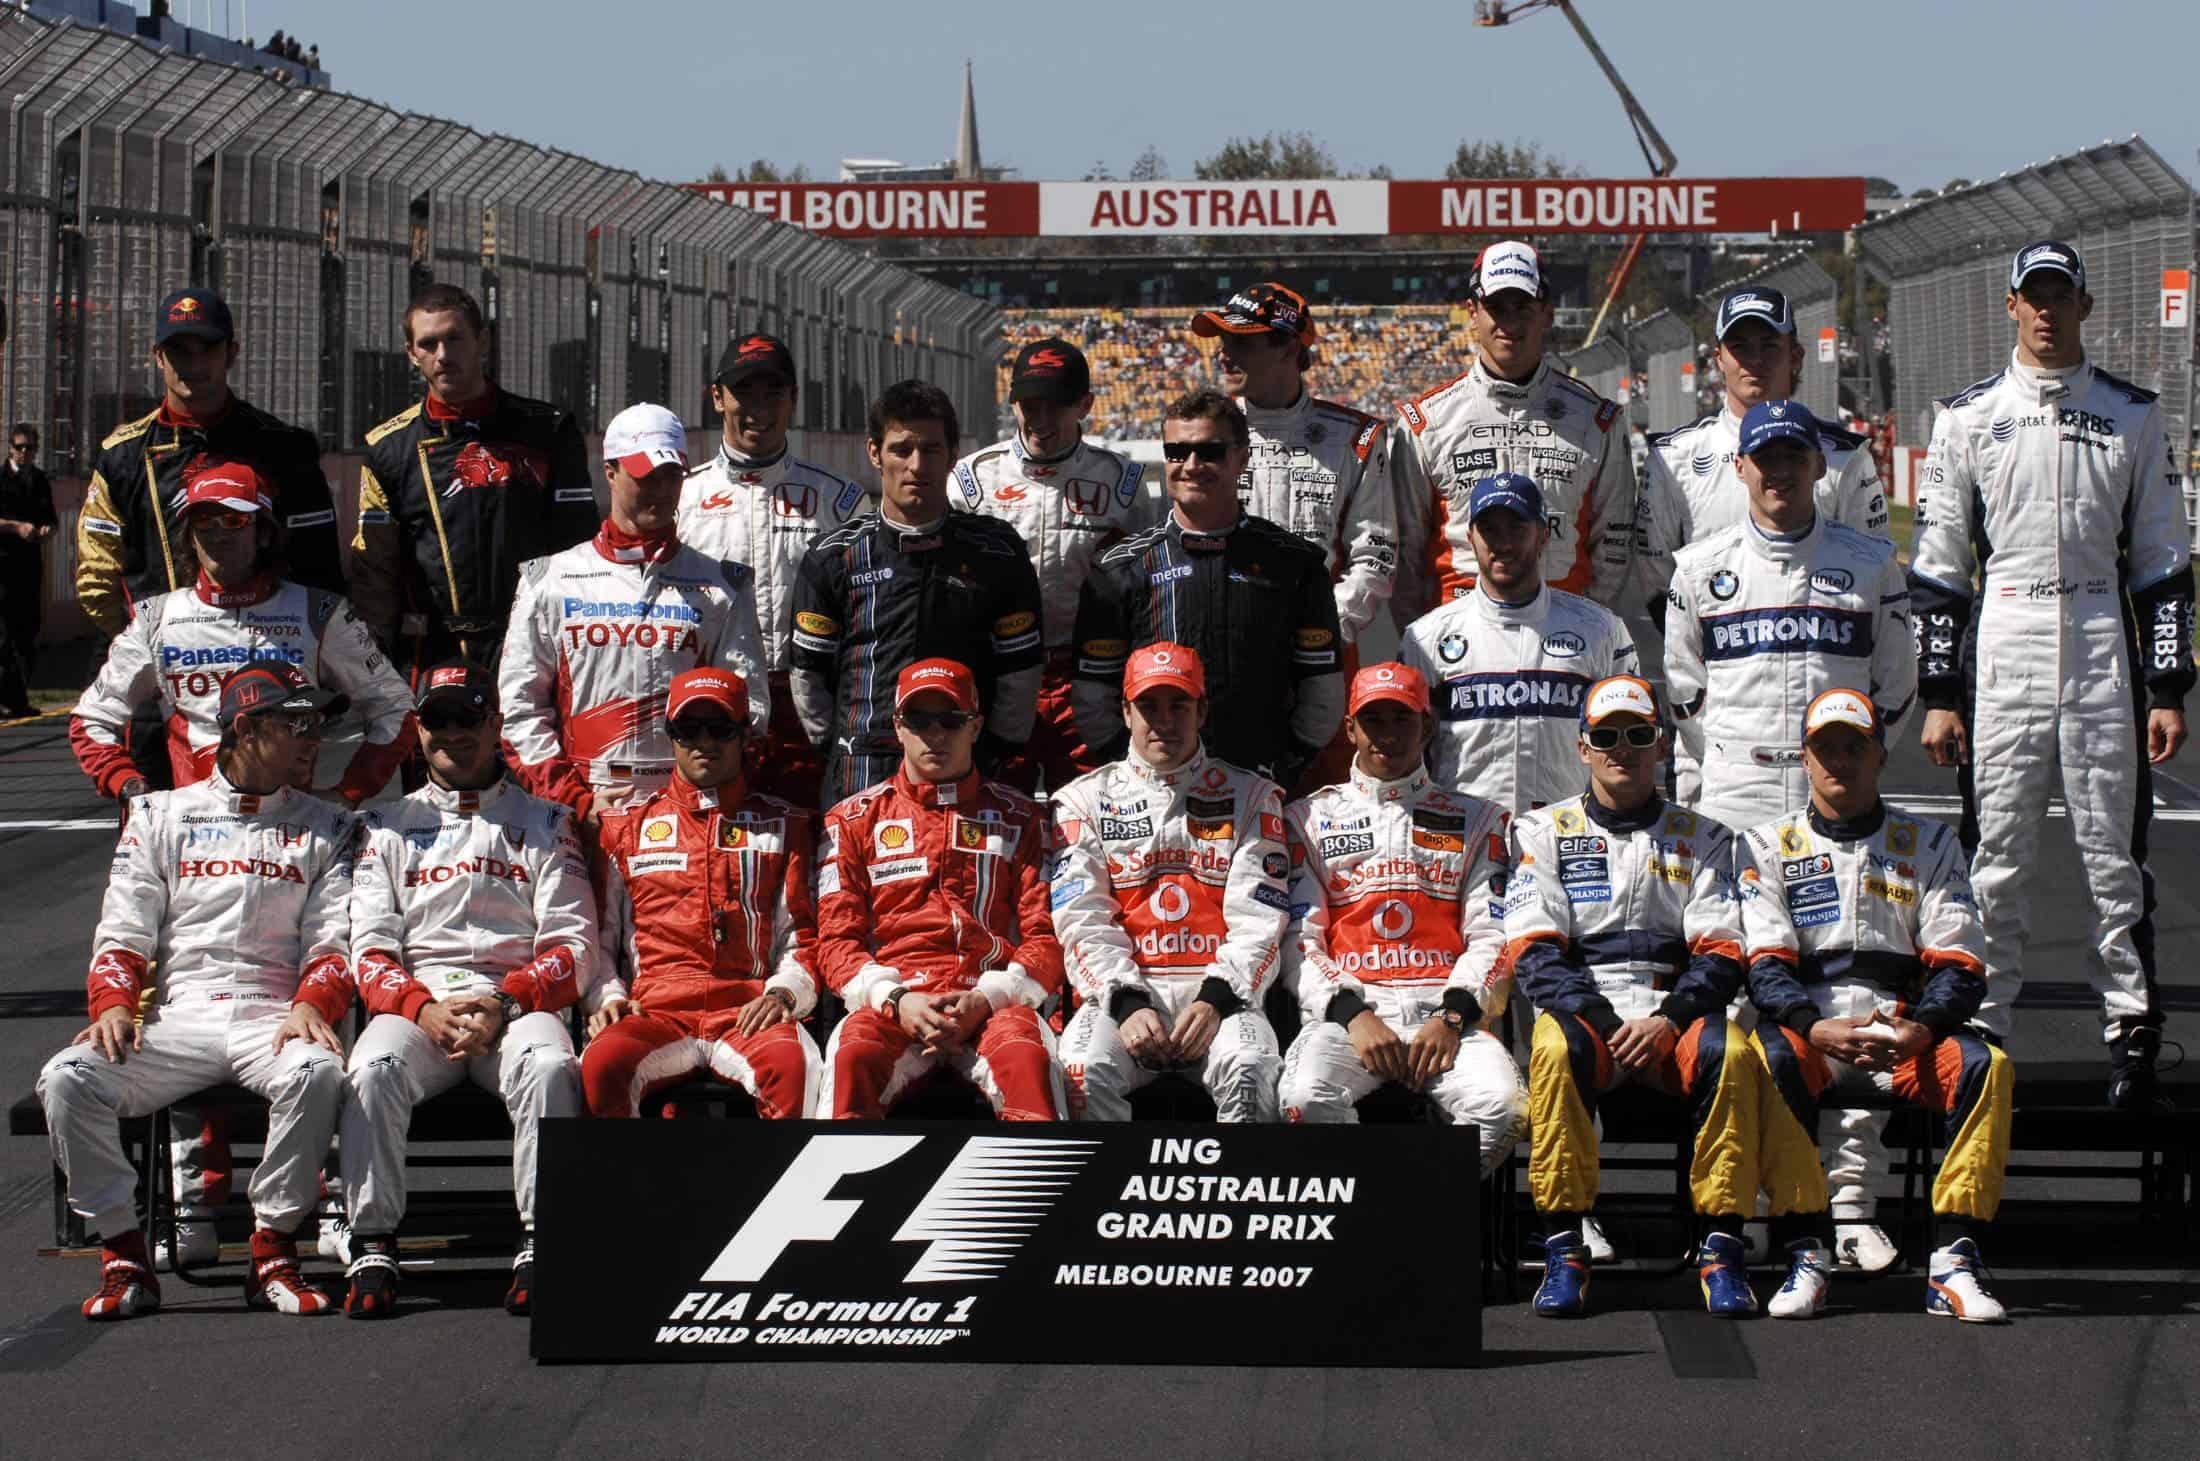 2007 Australian GP all drivers photo Photo Ferrari